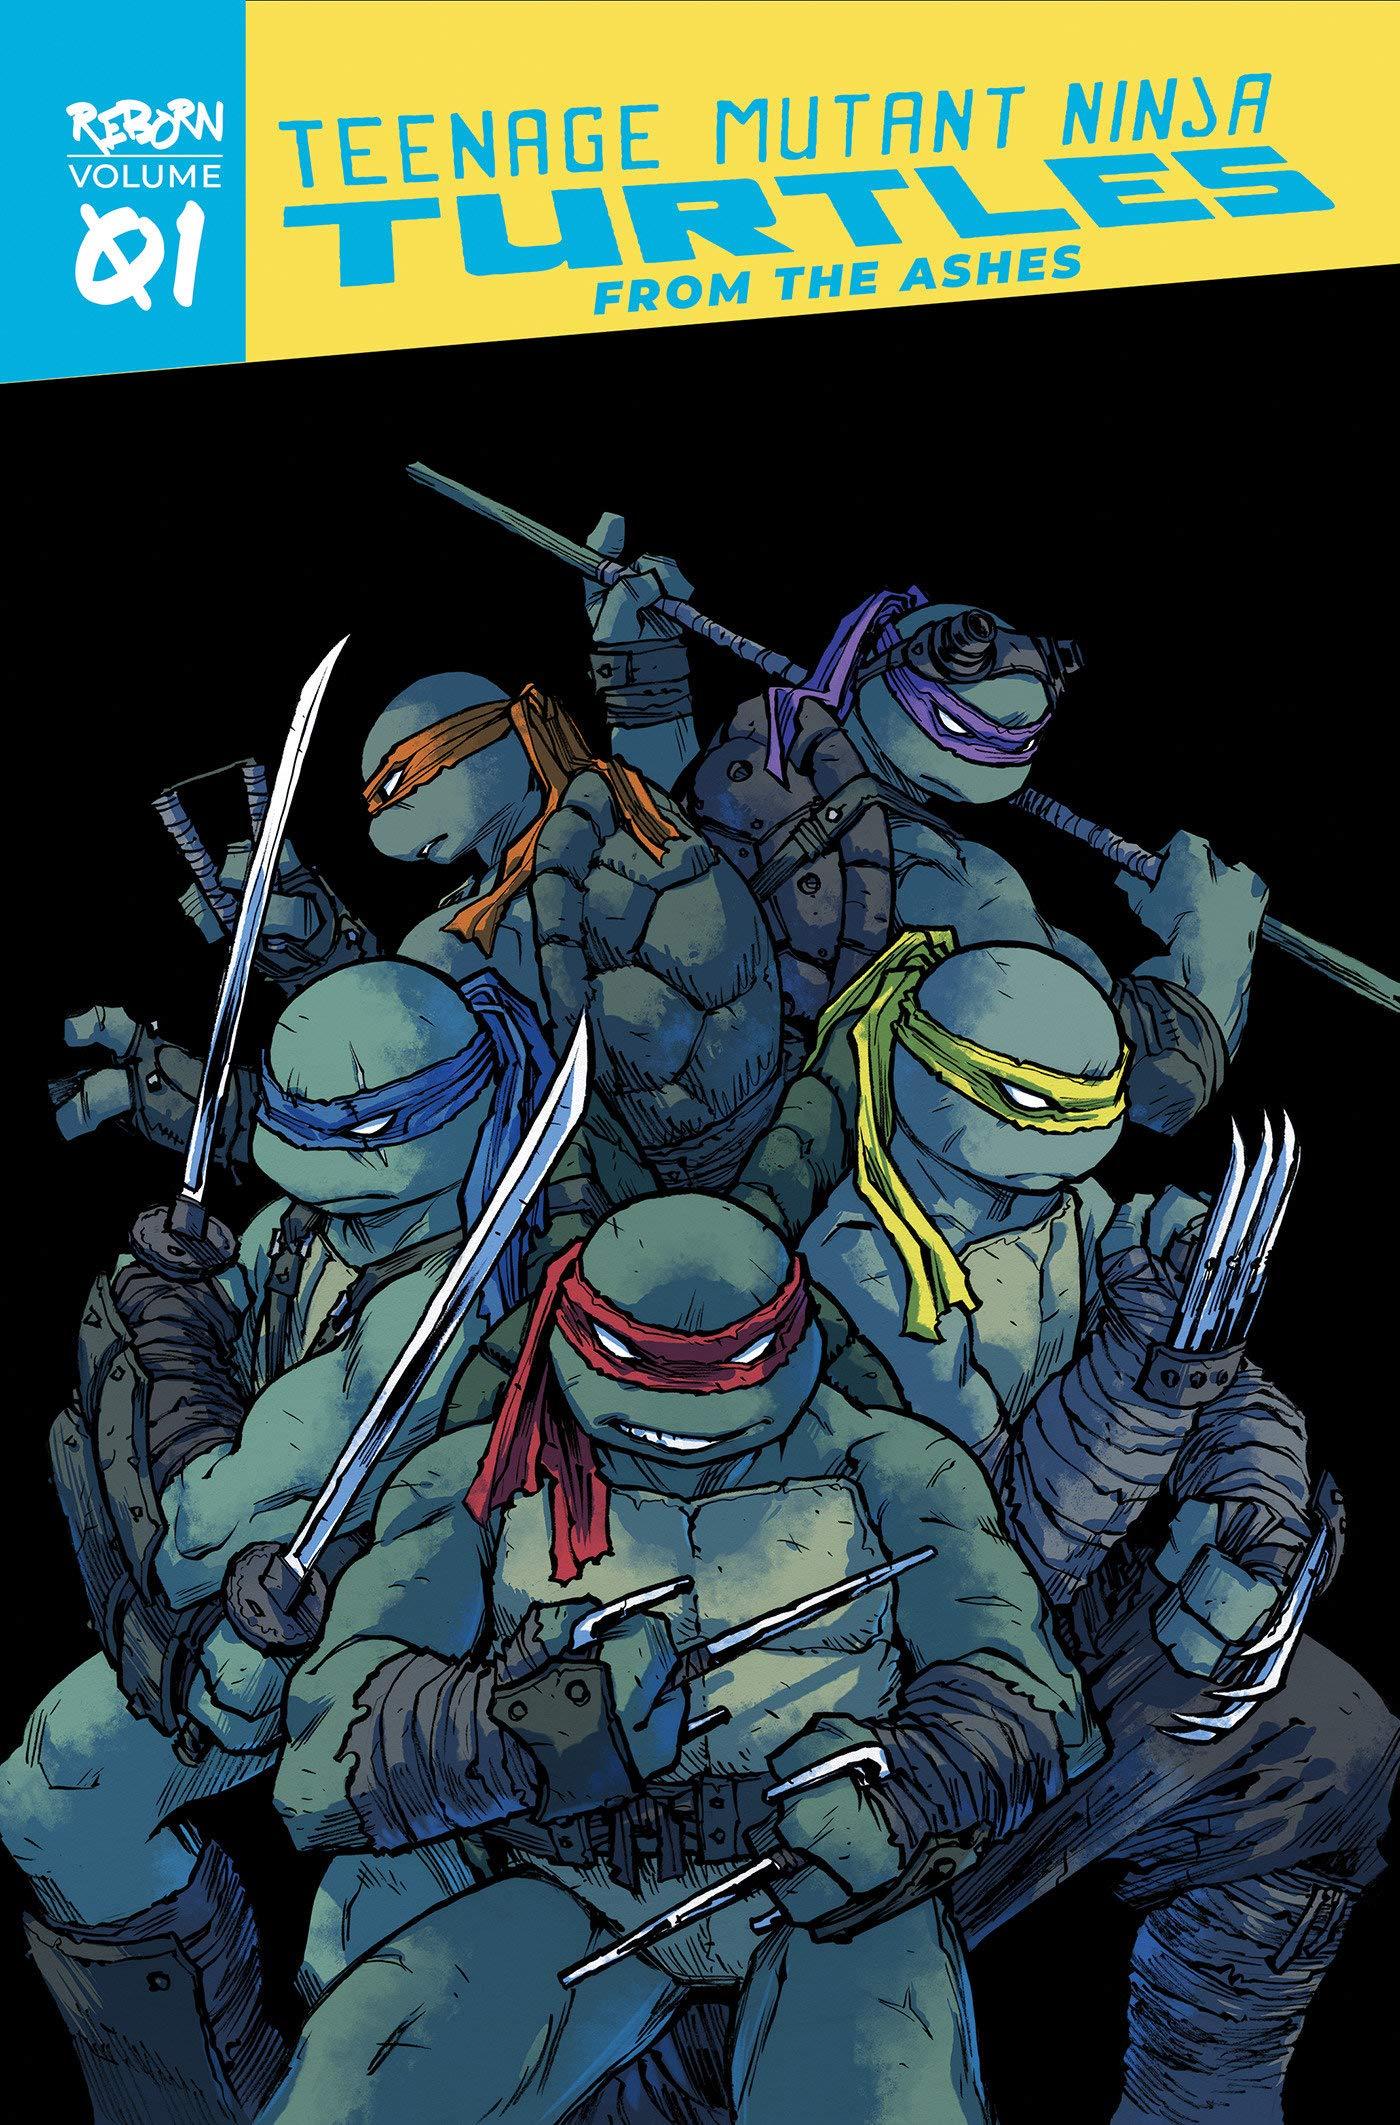 Teenage Mutant Ninja Turtles: Reborn, Vol. 1 - From The ...